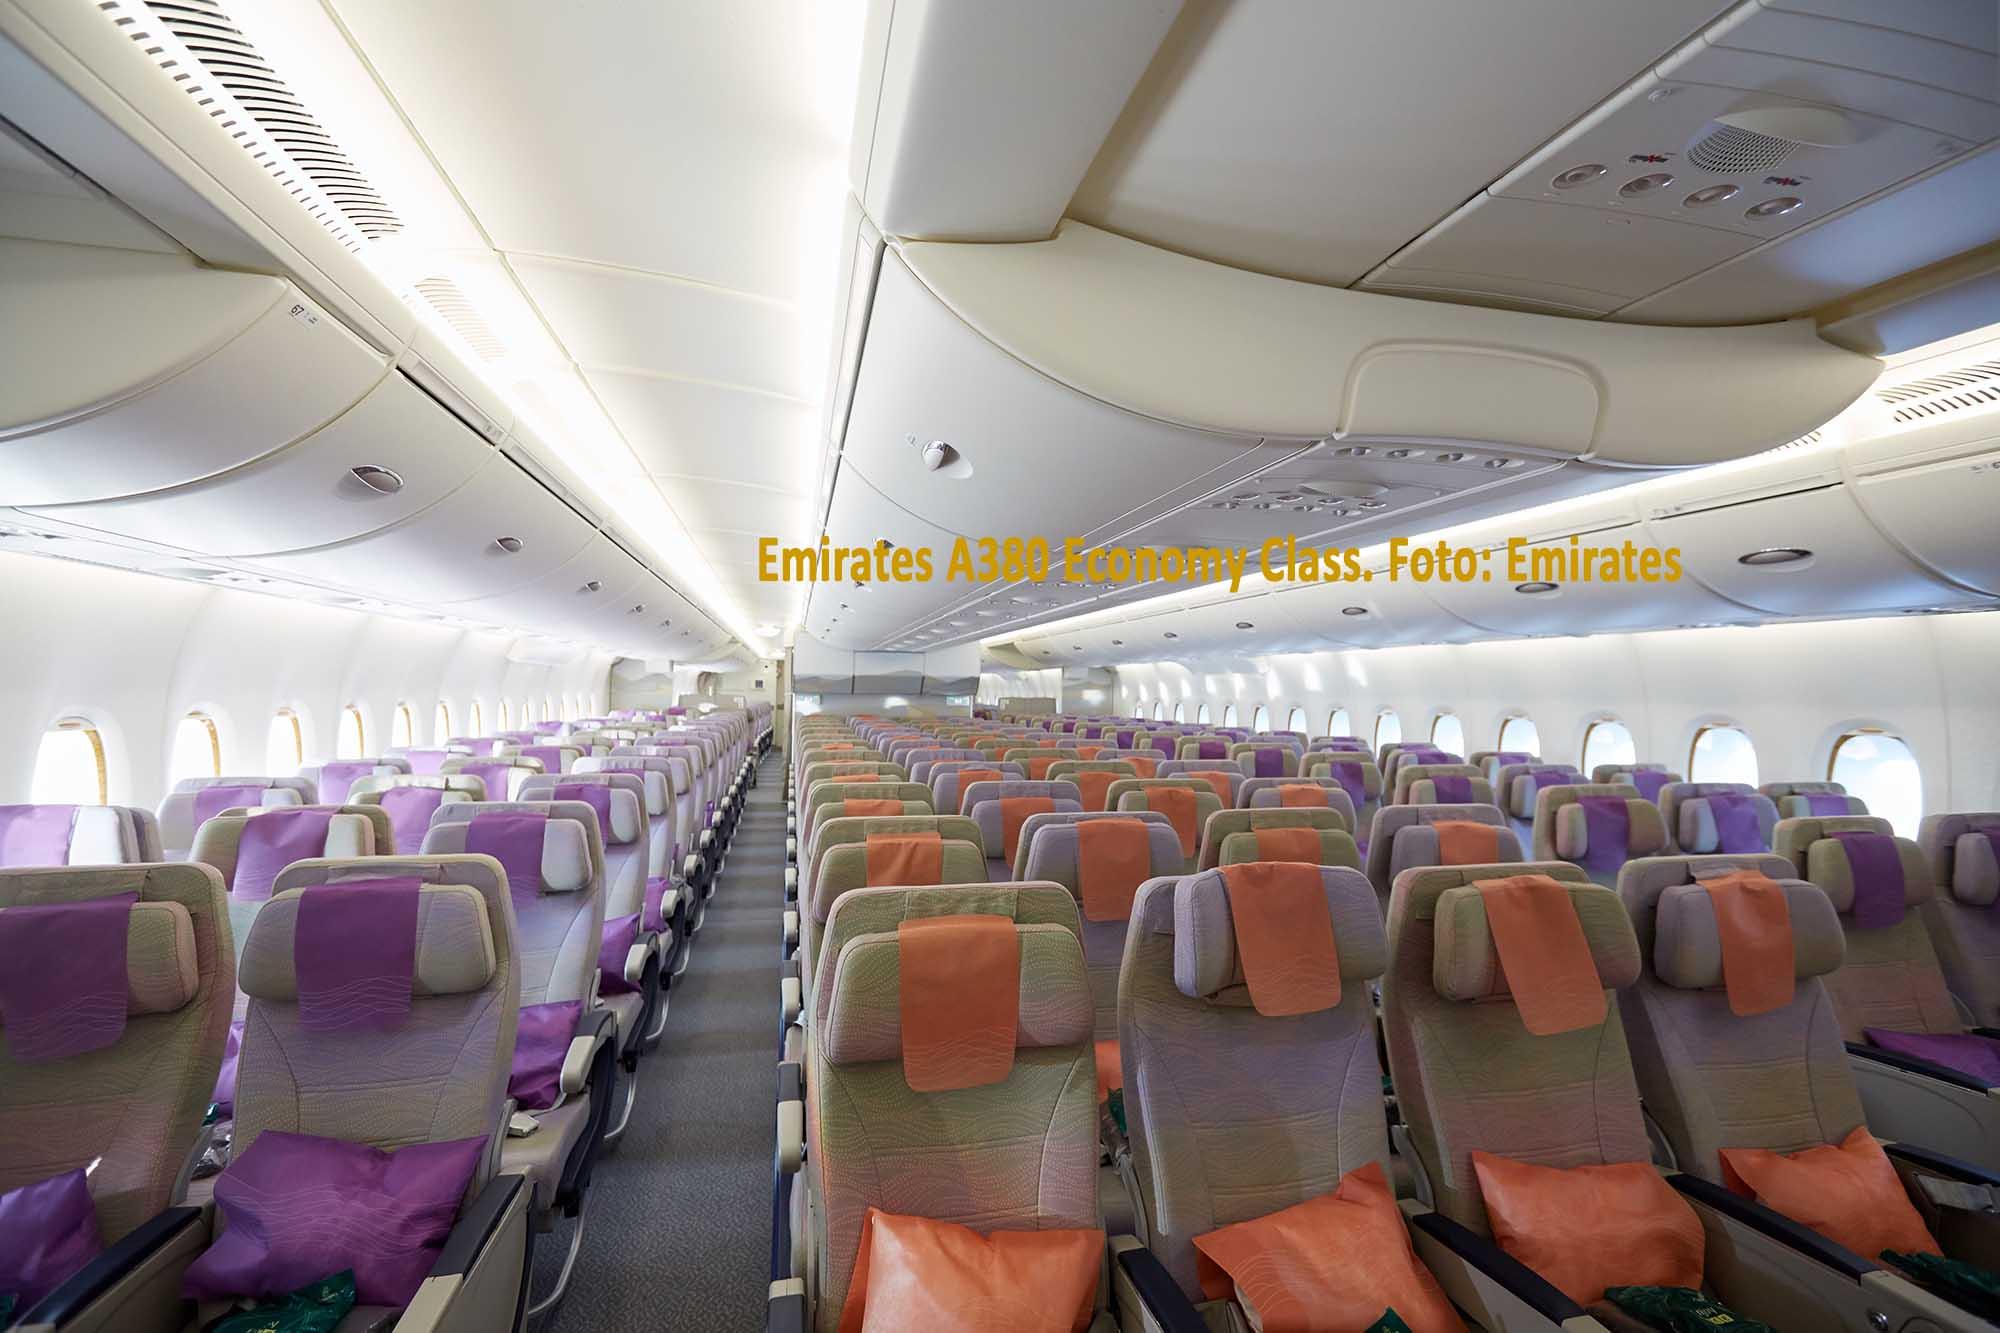 Emirates A380 Economy Class. / Foto: Emirates